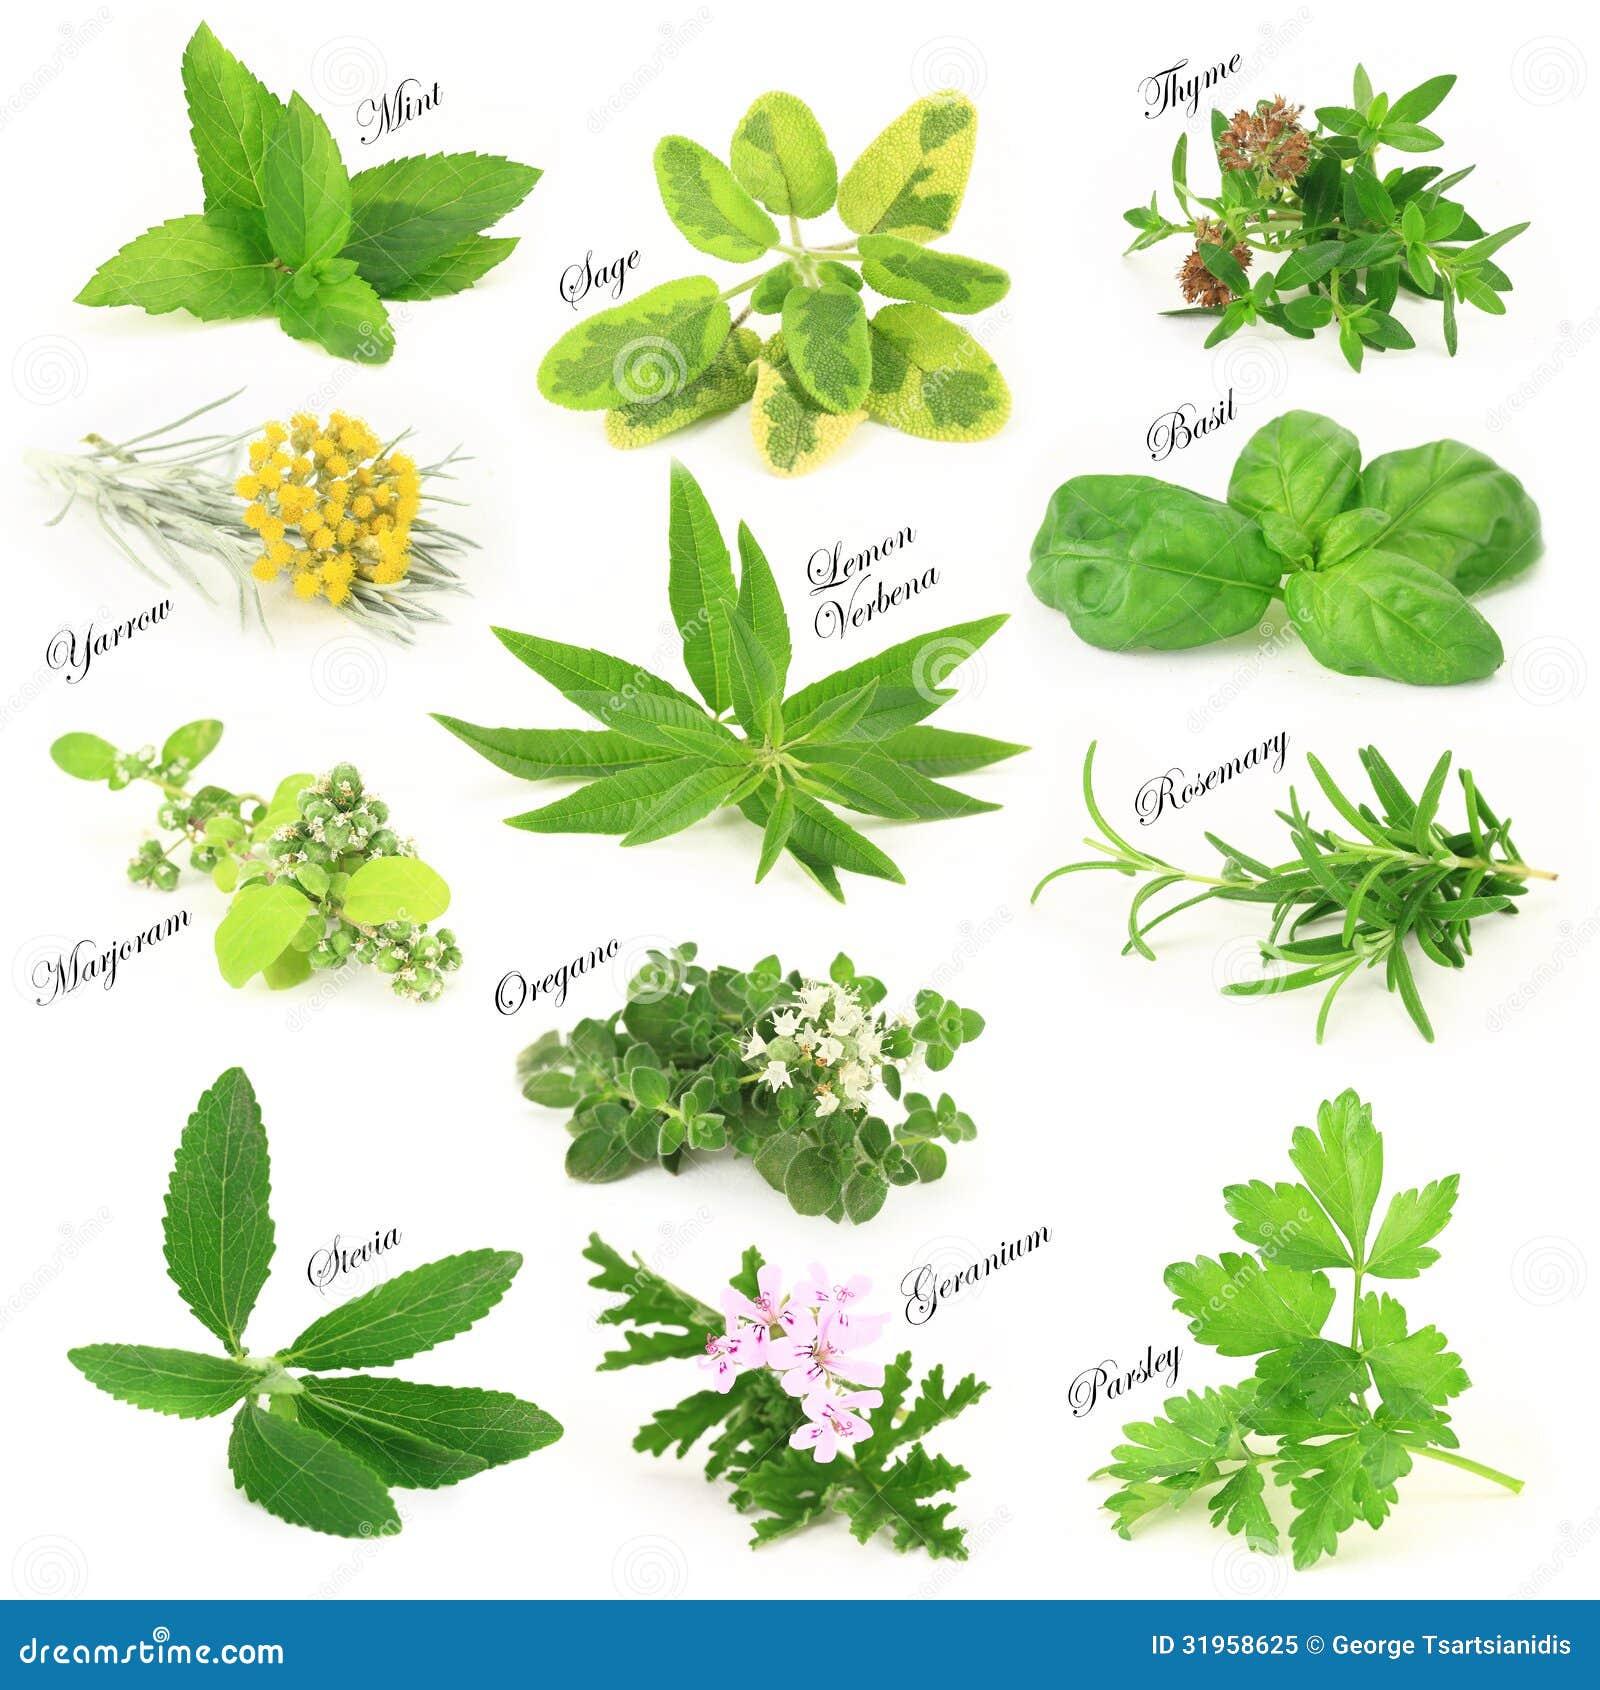 Hierbas arom ticas frescas for Plantas aromaticas para cocinar